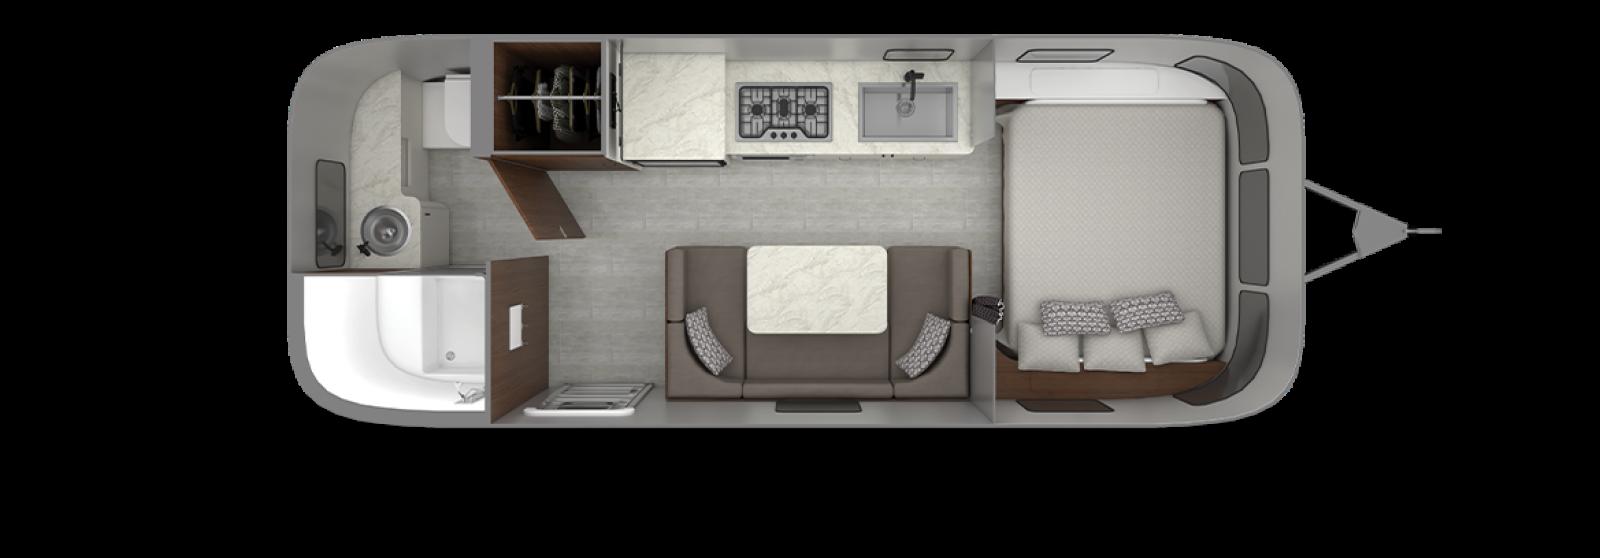 Caravel 22FB Floor Plan | Travel